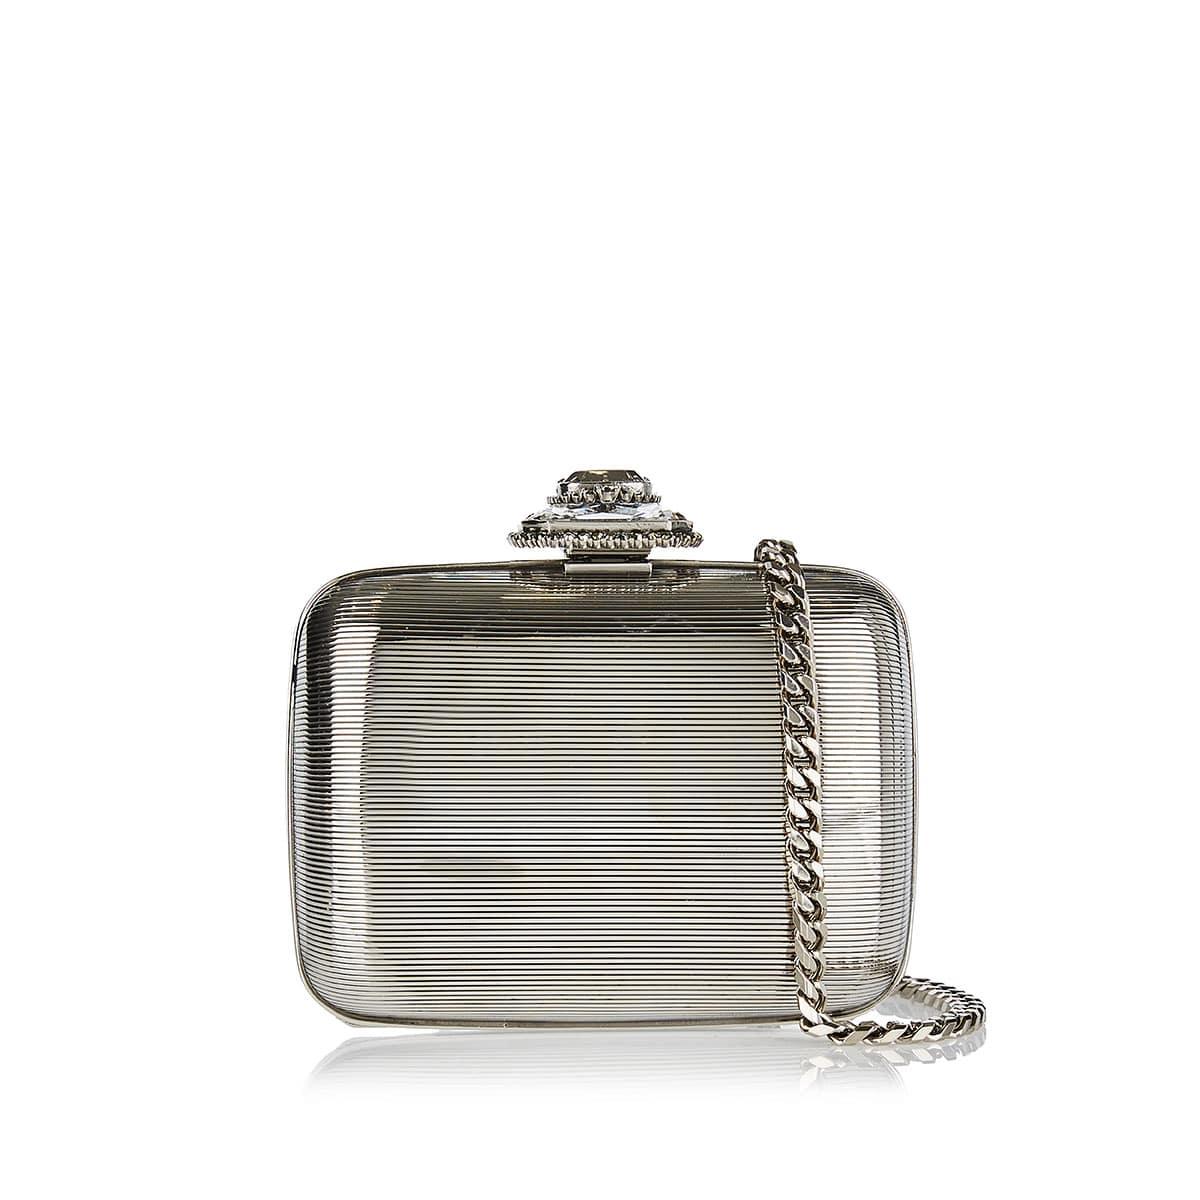 Embellished mini metal clutch